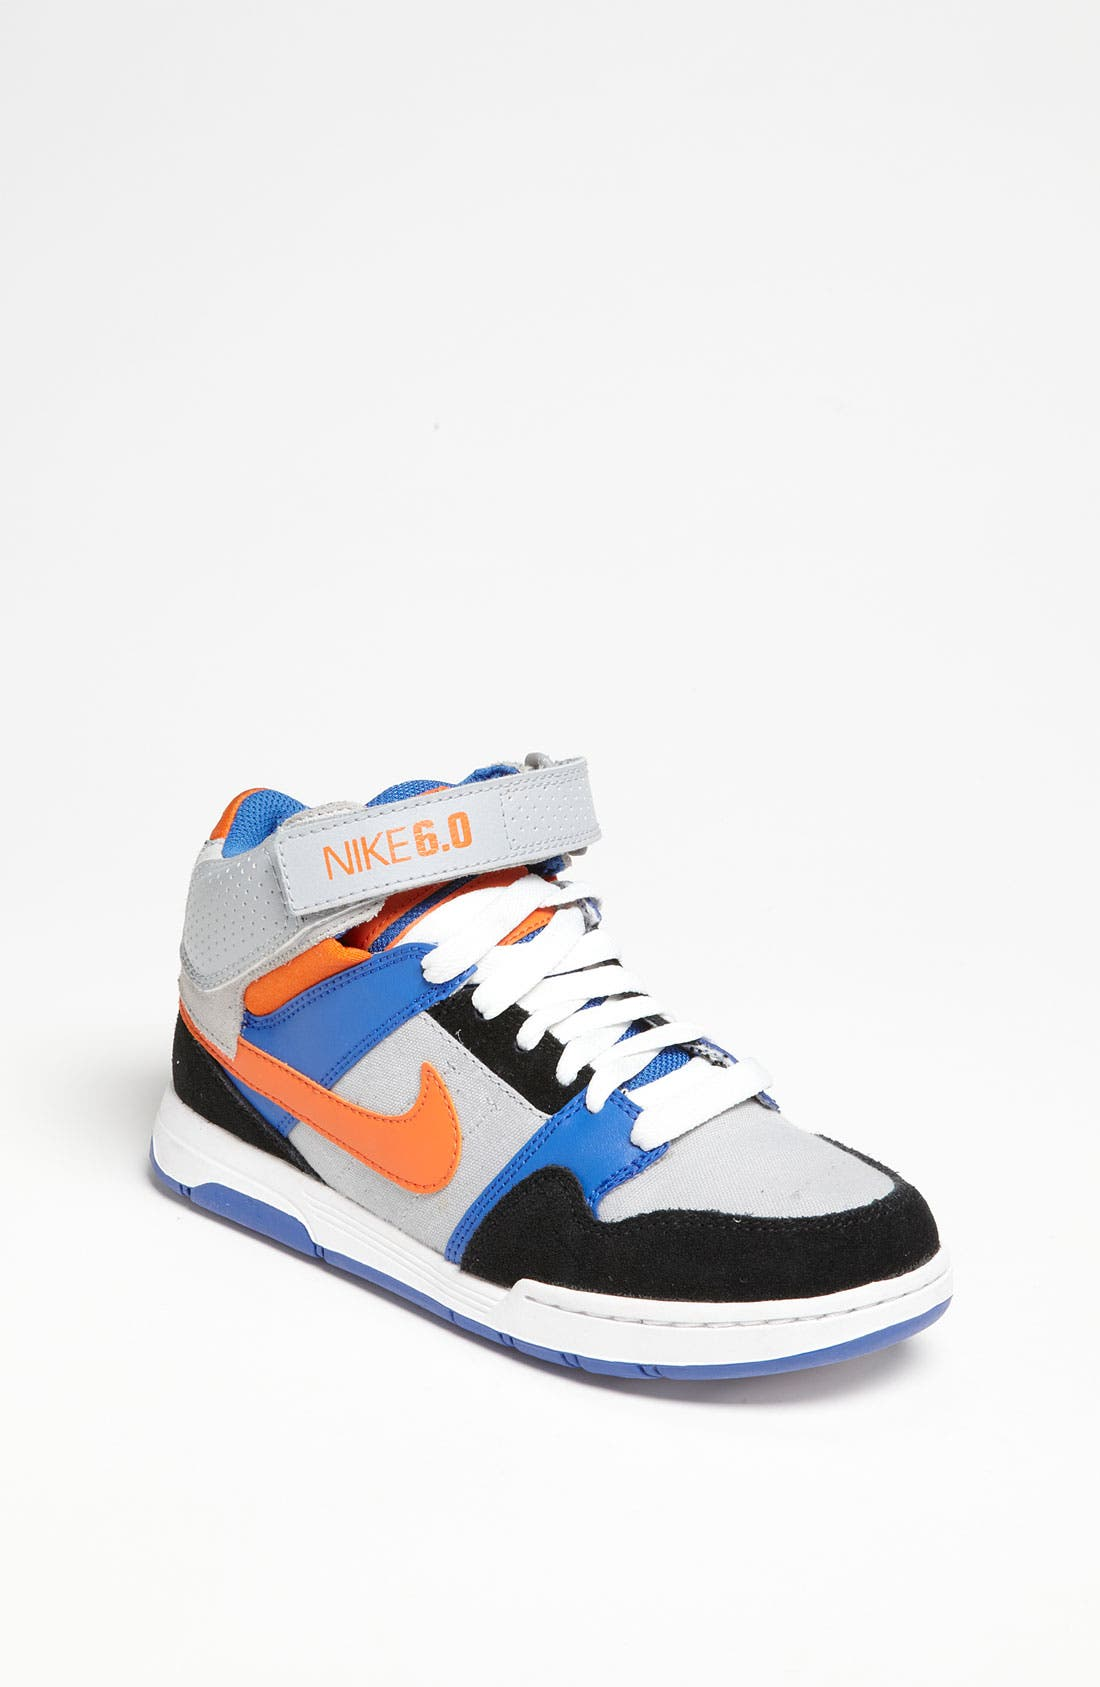 Main Image - Nike 6.0 'Mogan Mid 2 Jr.' Sneaker (Little Kid & Big Kid)